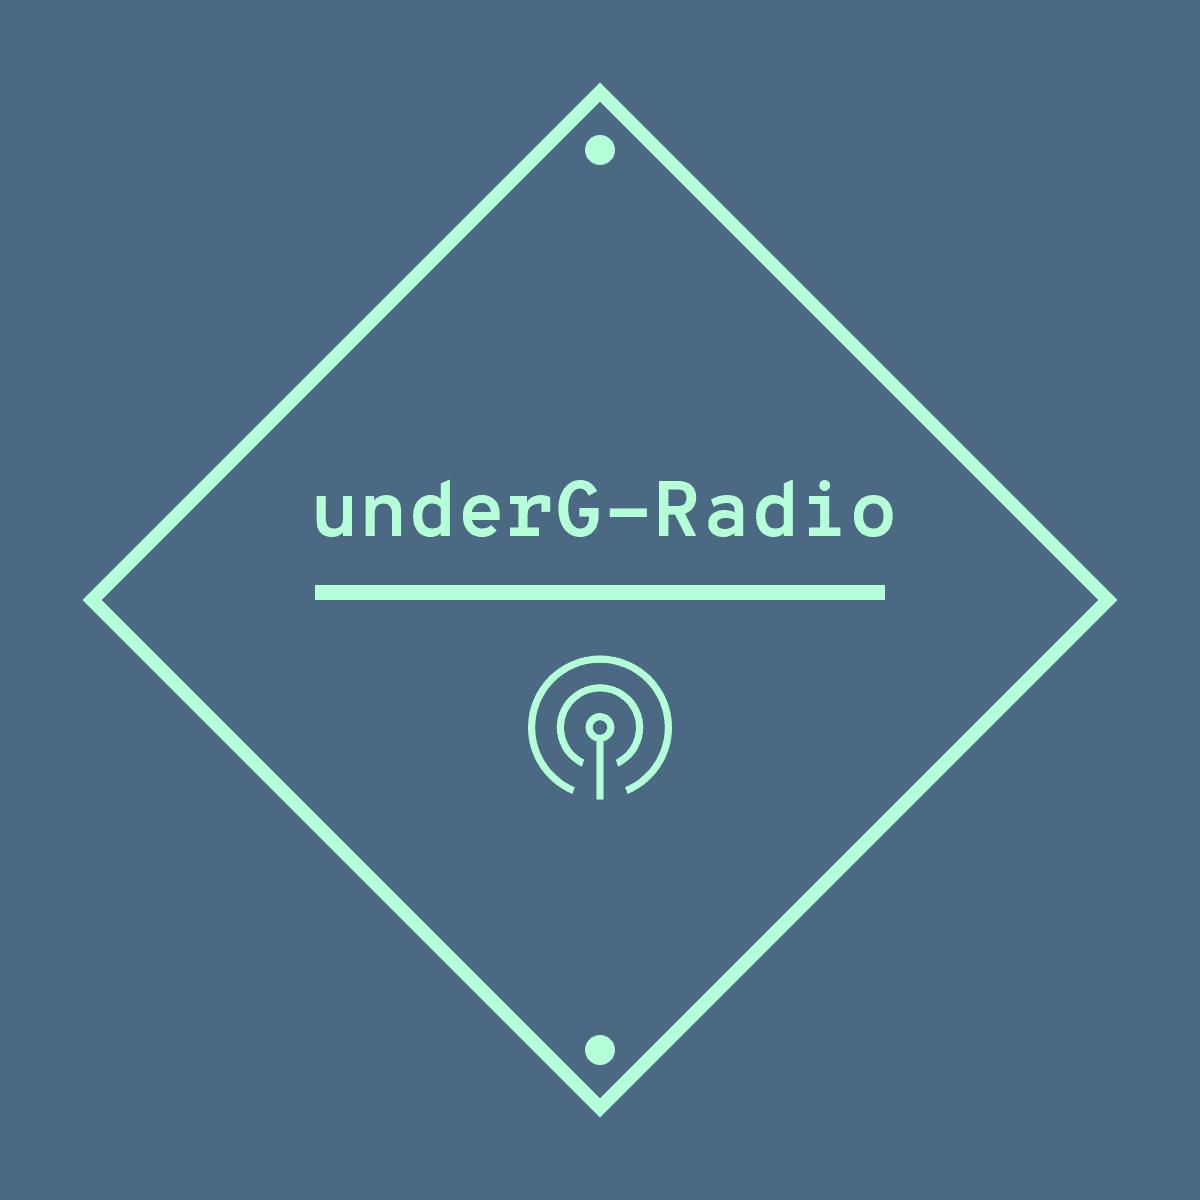 underG-Radio